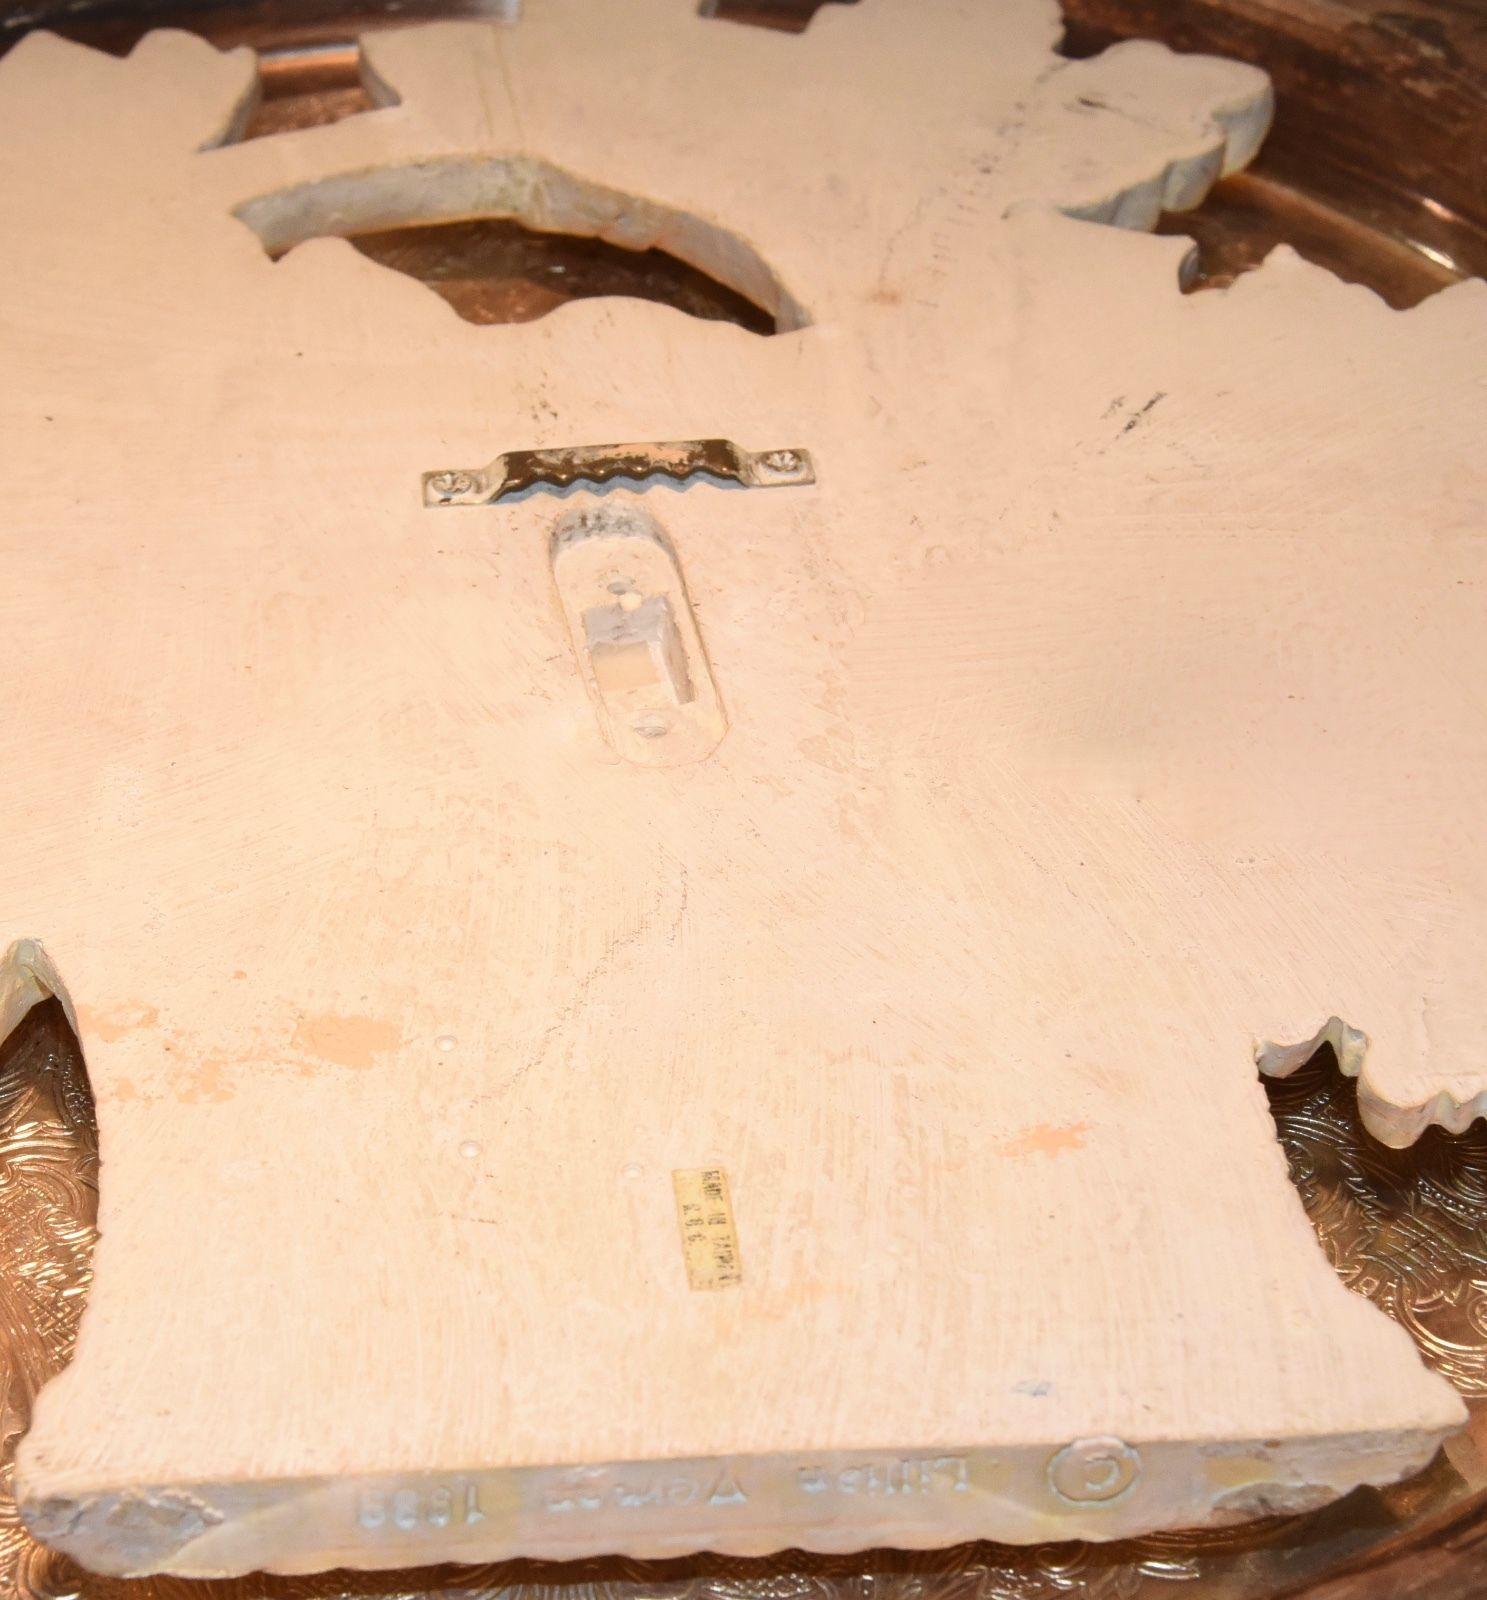 "LILLIAN VERNON RESIN WALL PLAQUE FRUIT BASKET 1989 CREAM COLORED 9.5"" x 10"""